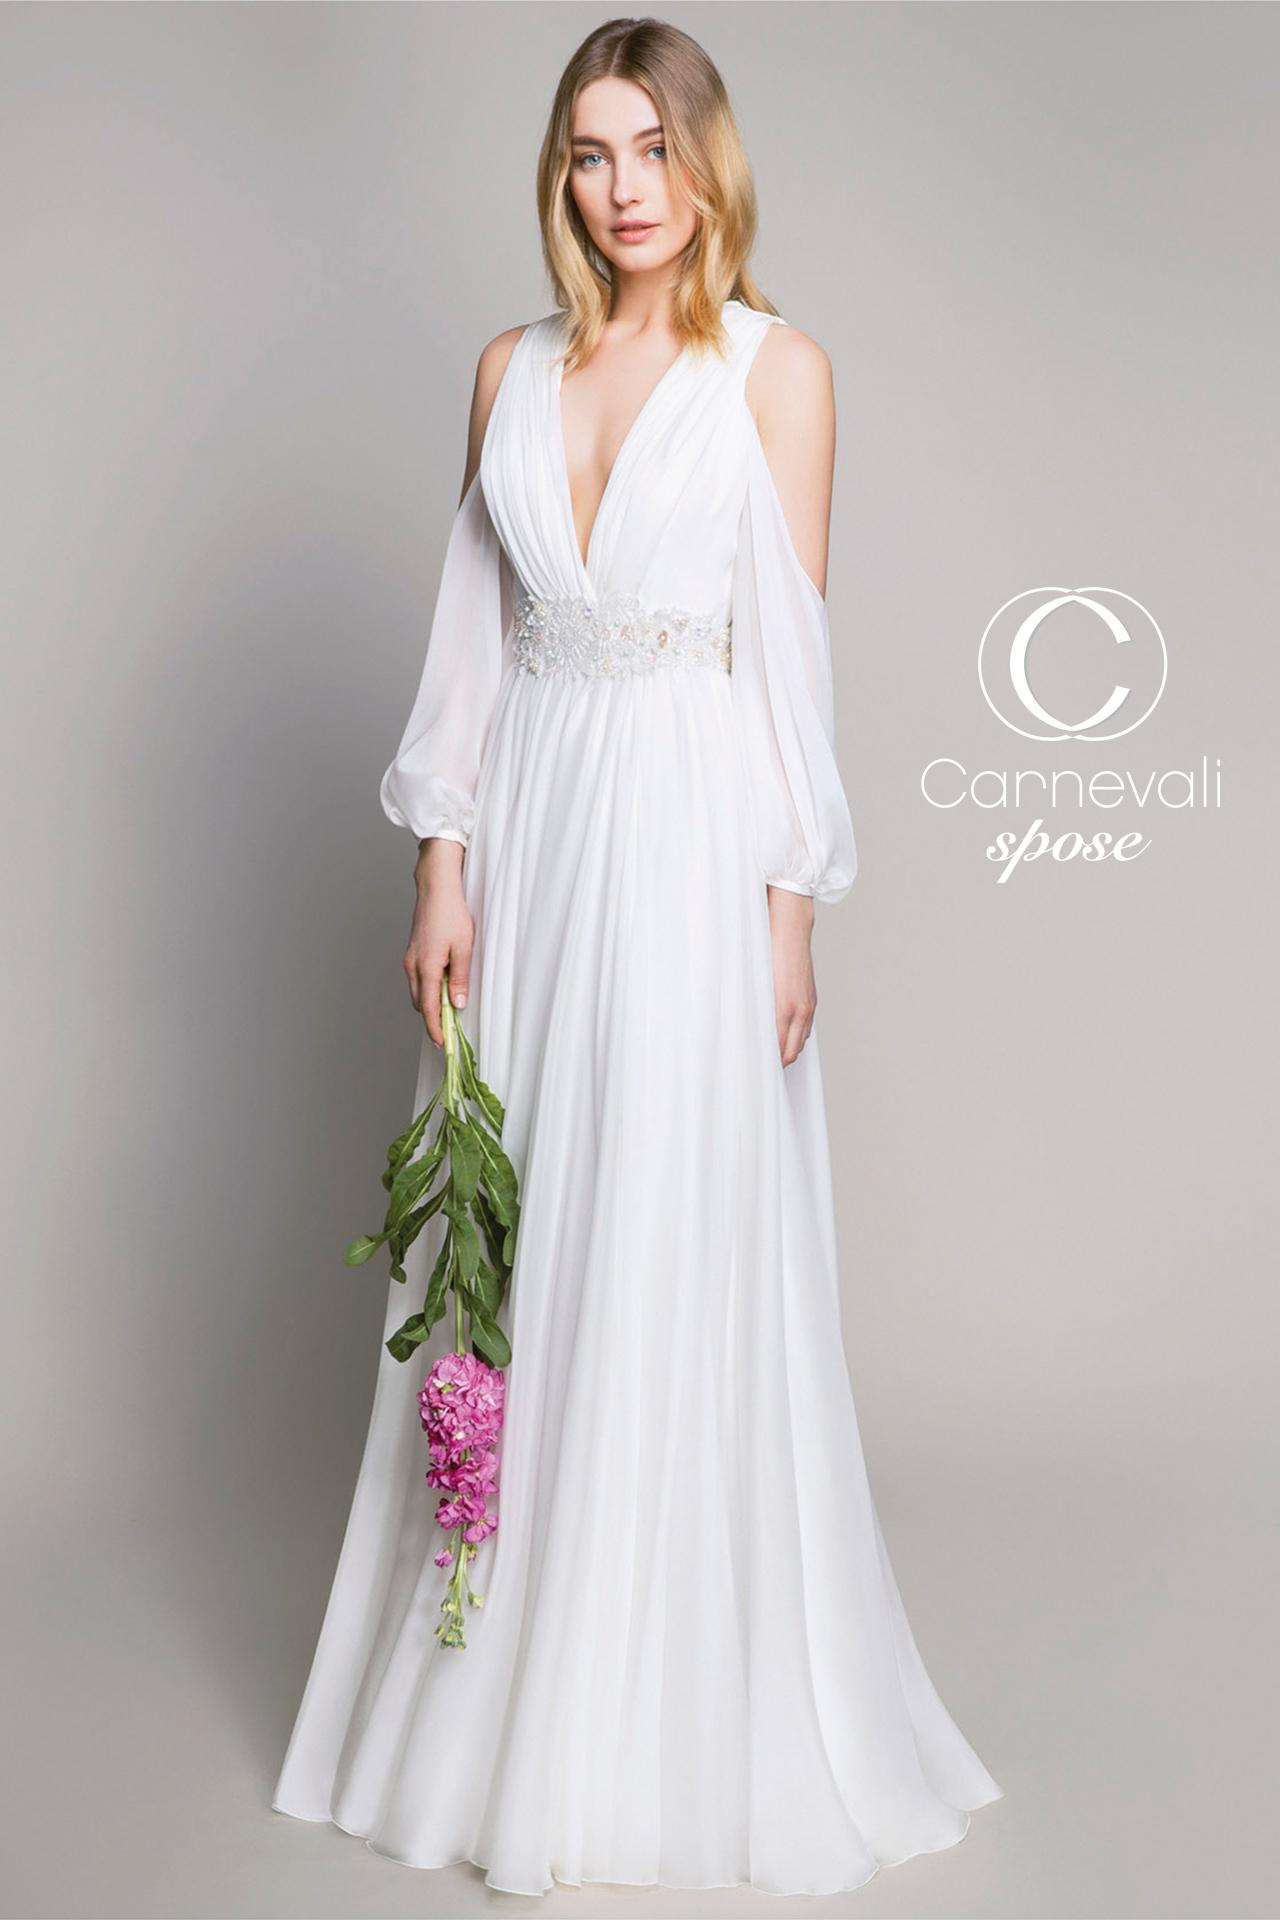 75e4b30e7b06 BLUMARINE 6772 - Carnevali Spose